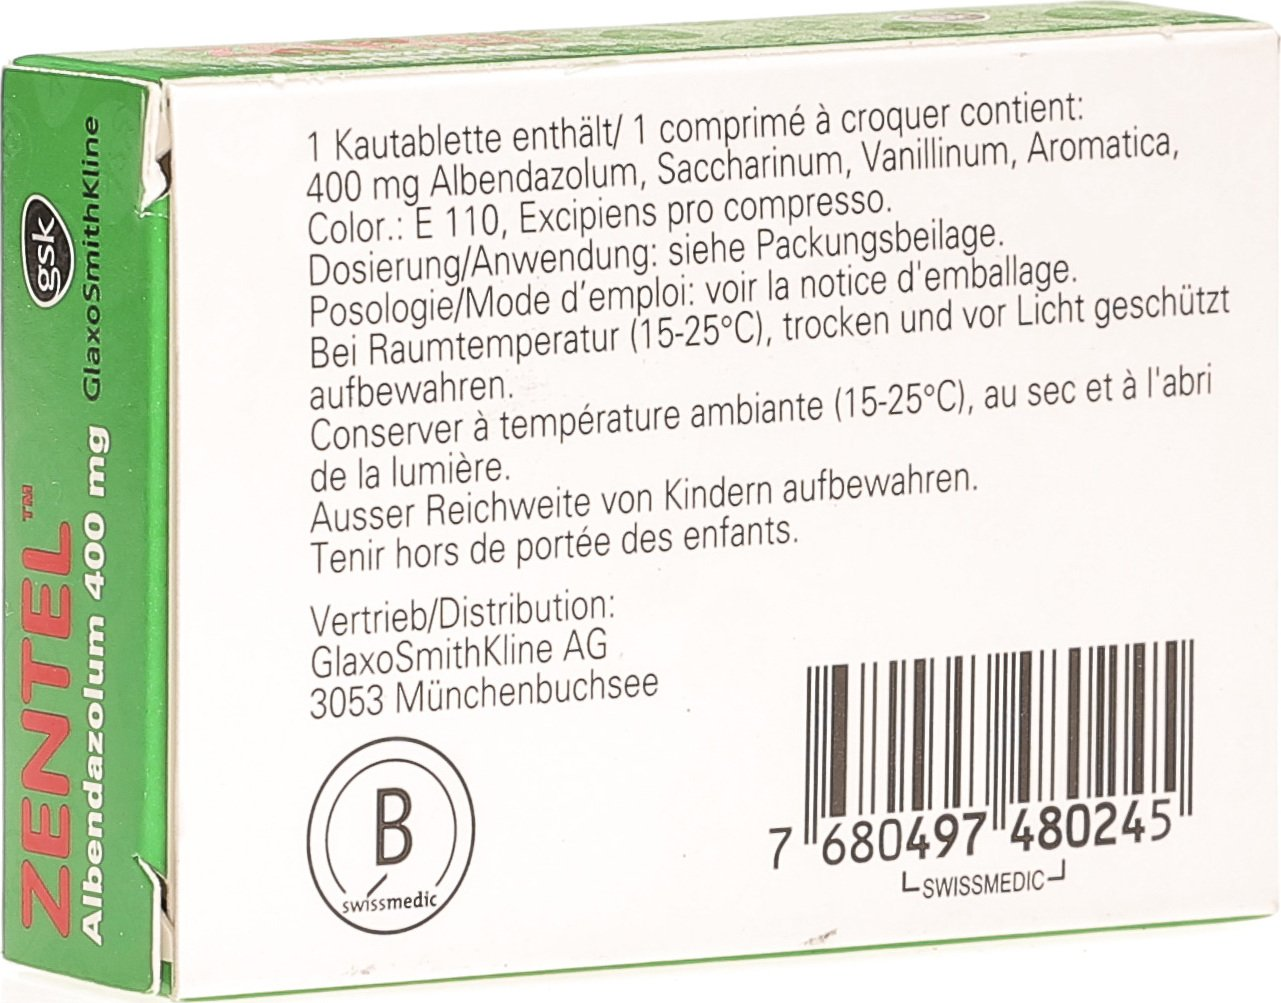 Zentel Kautabletten 400mg In Der Adler Apotheke